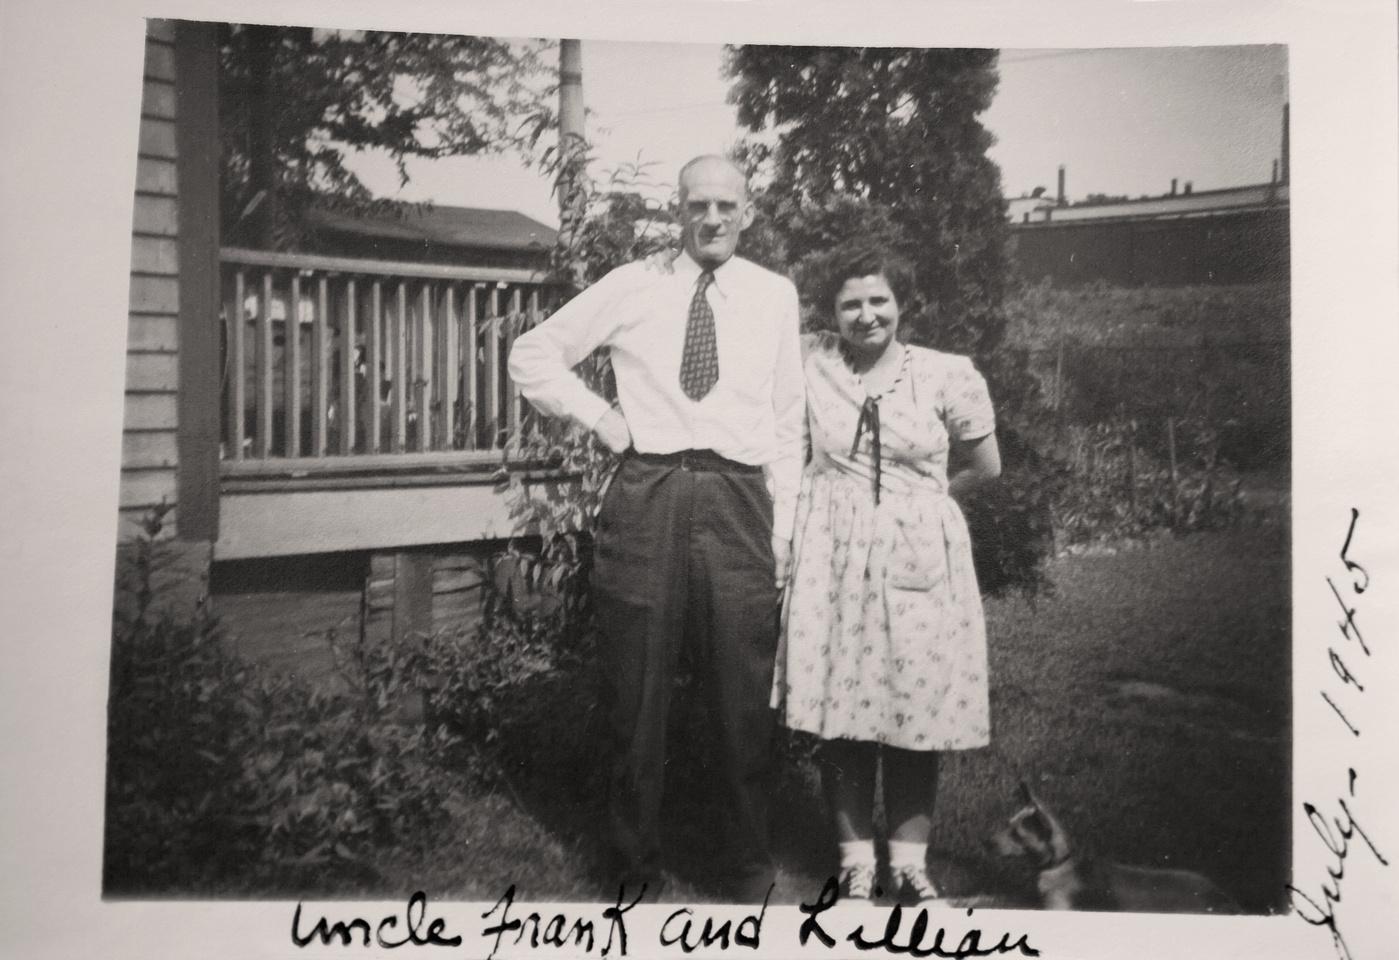 Michelle M. Murosky: The Murosky Collection &emdash; 1945 Murosky Family Gathering